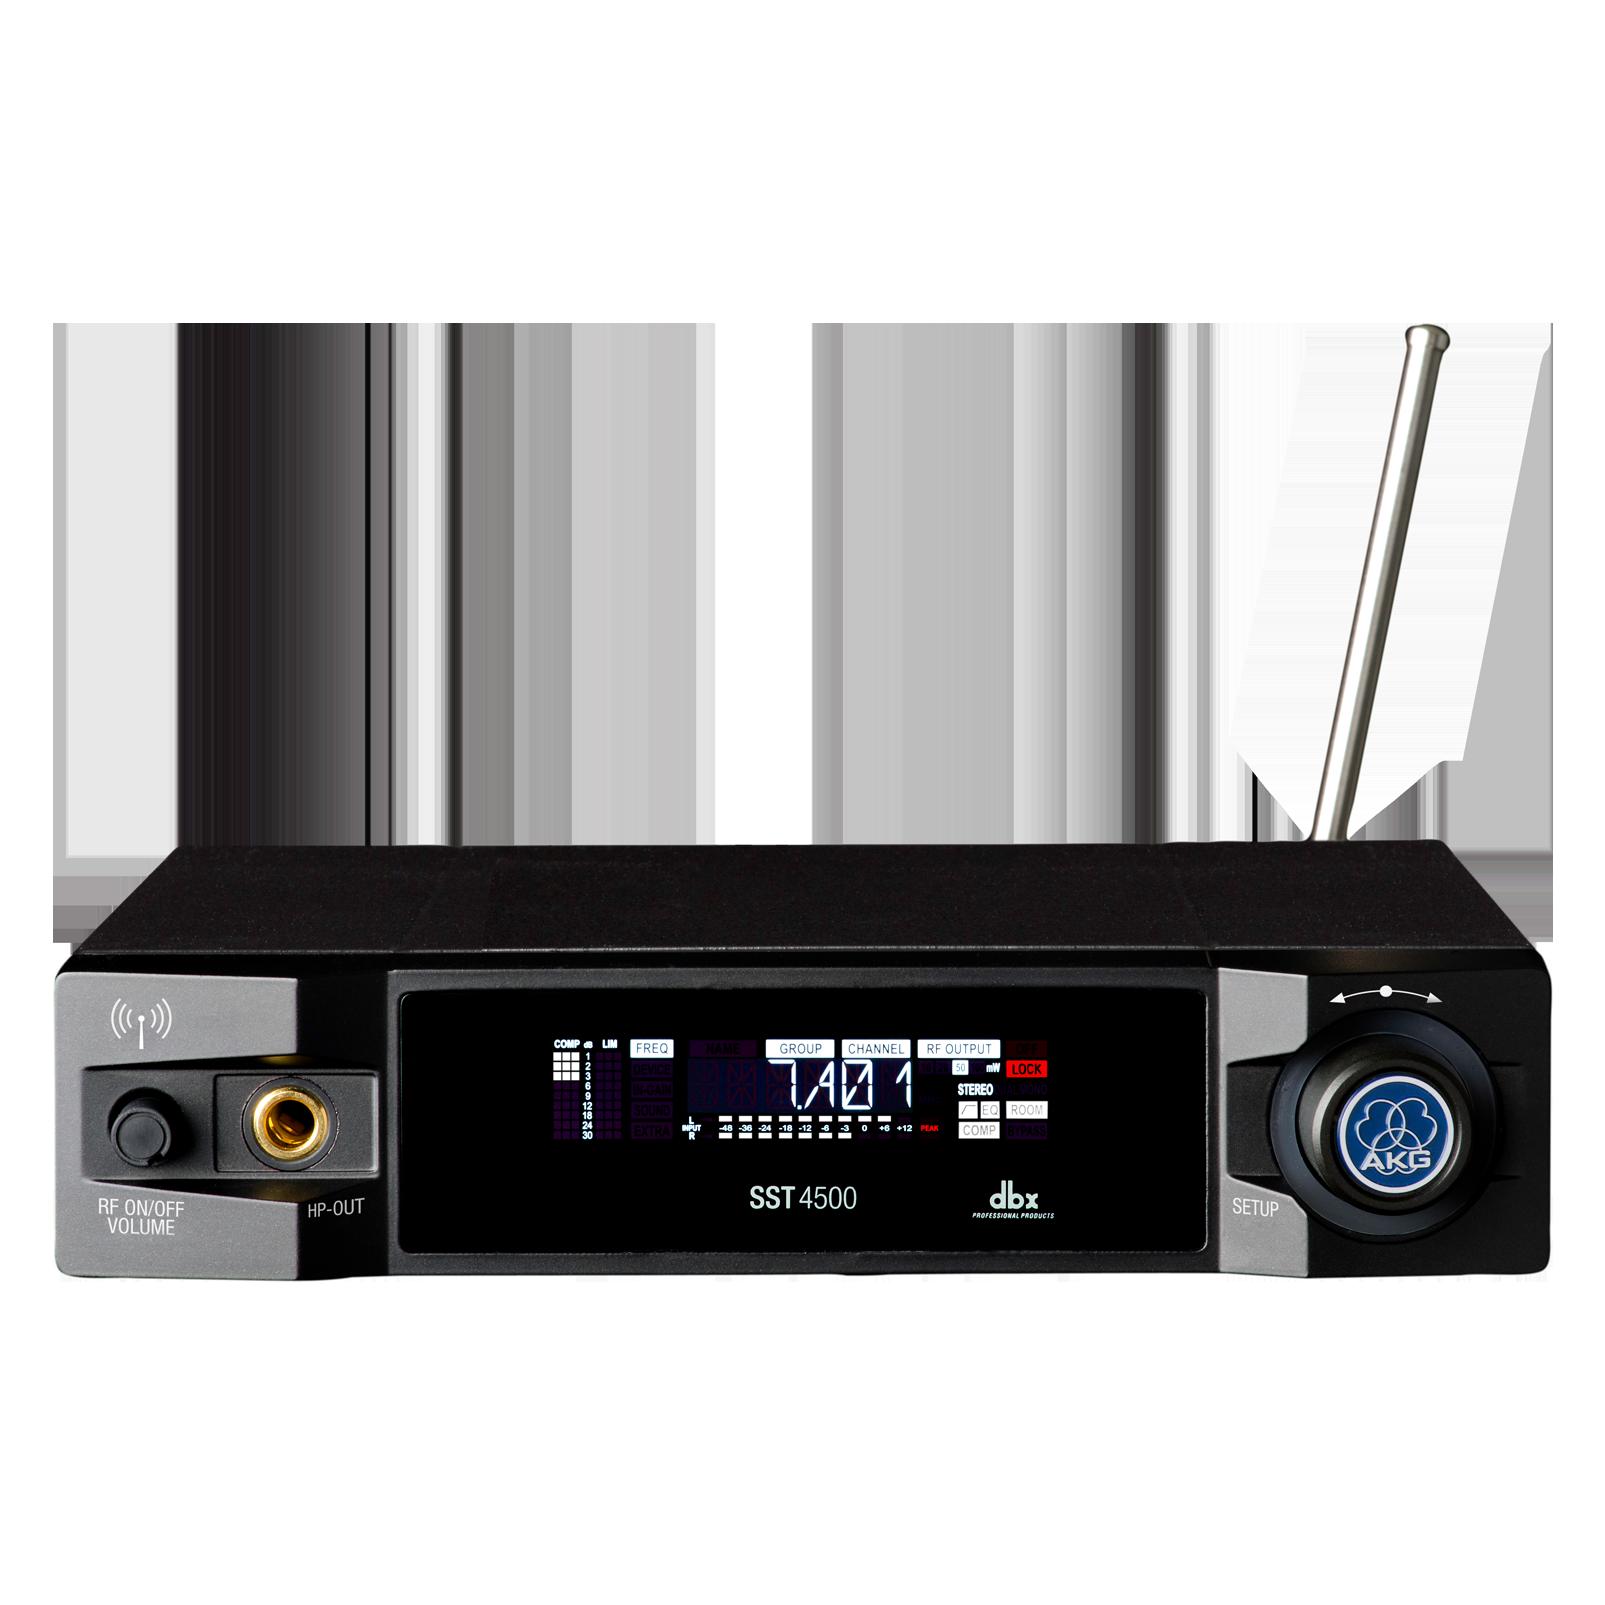 SST4500 IEM - Black - Reference wireless in-ear-monitoring stereo transmitter - Hero